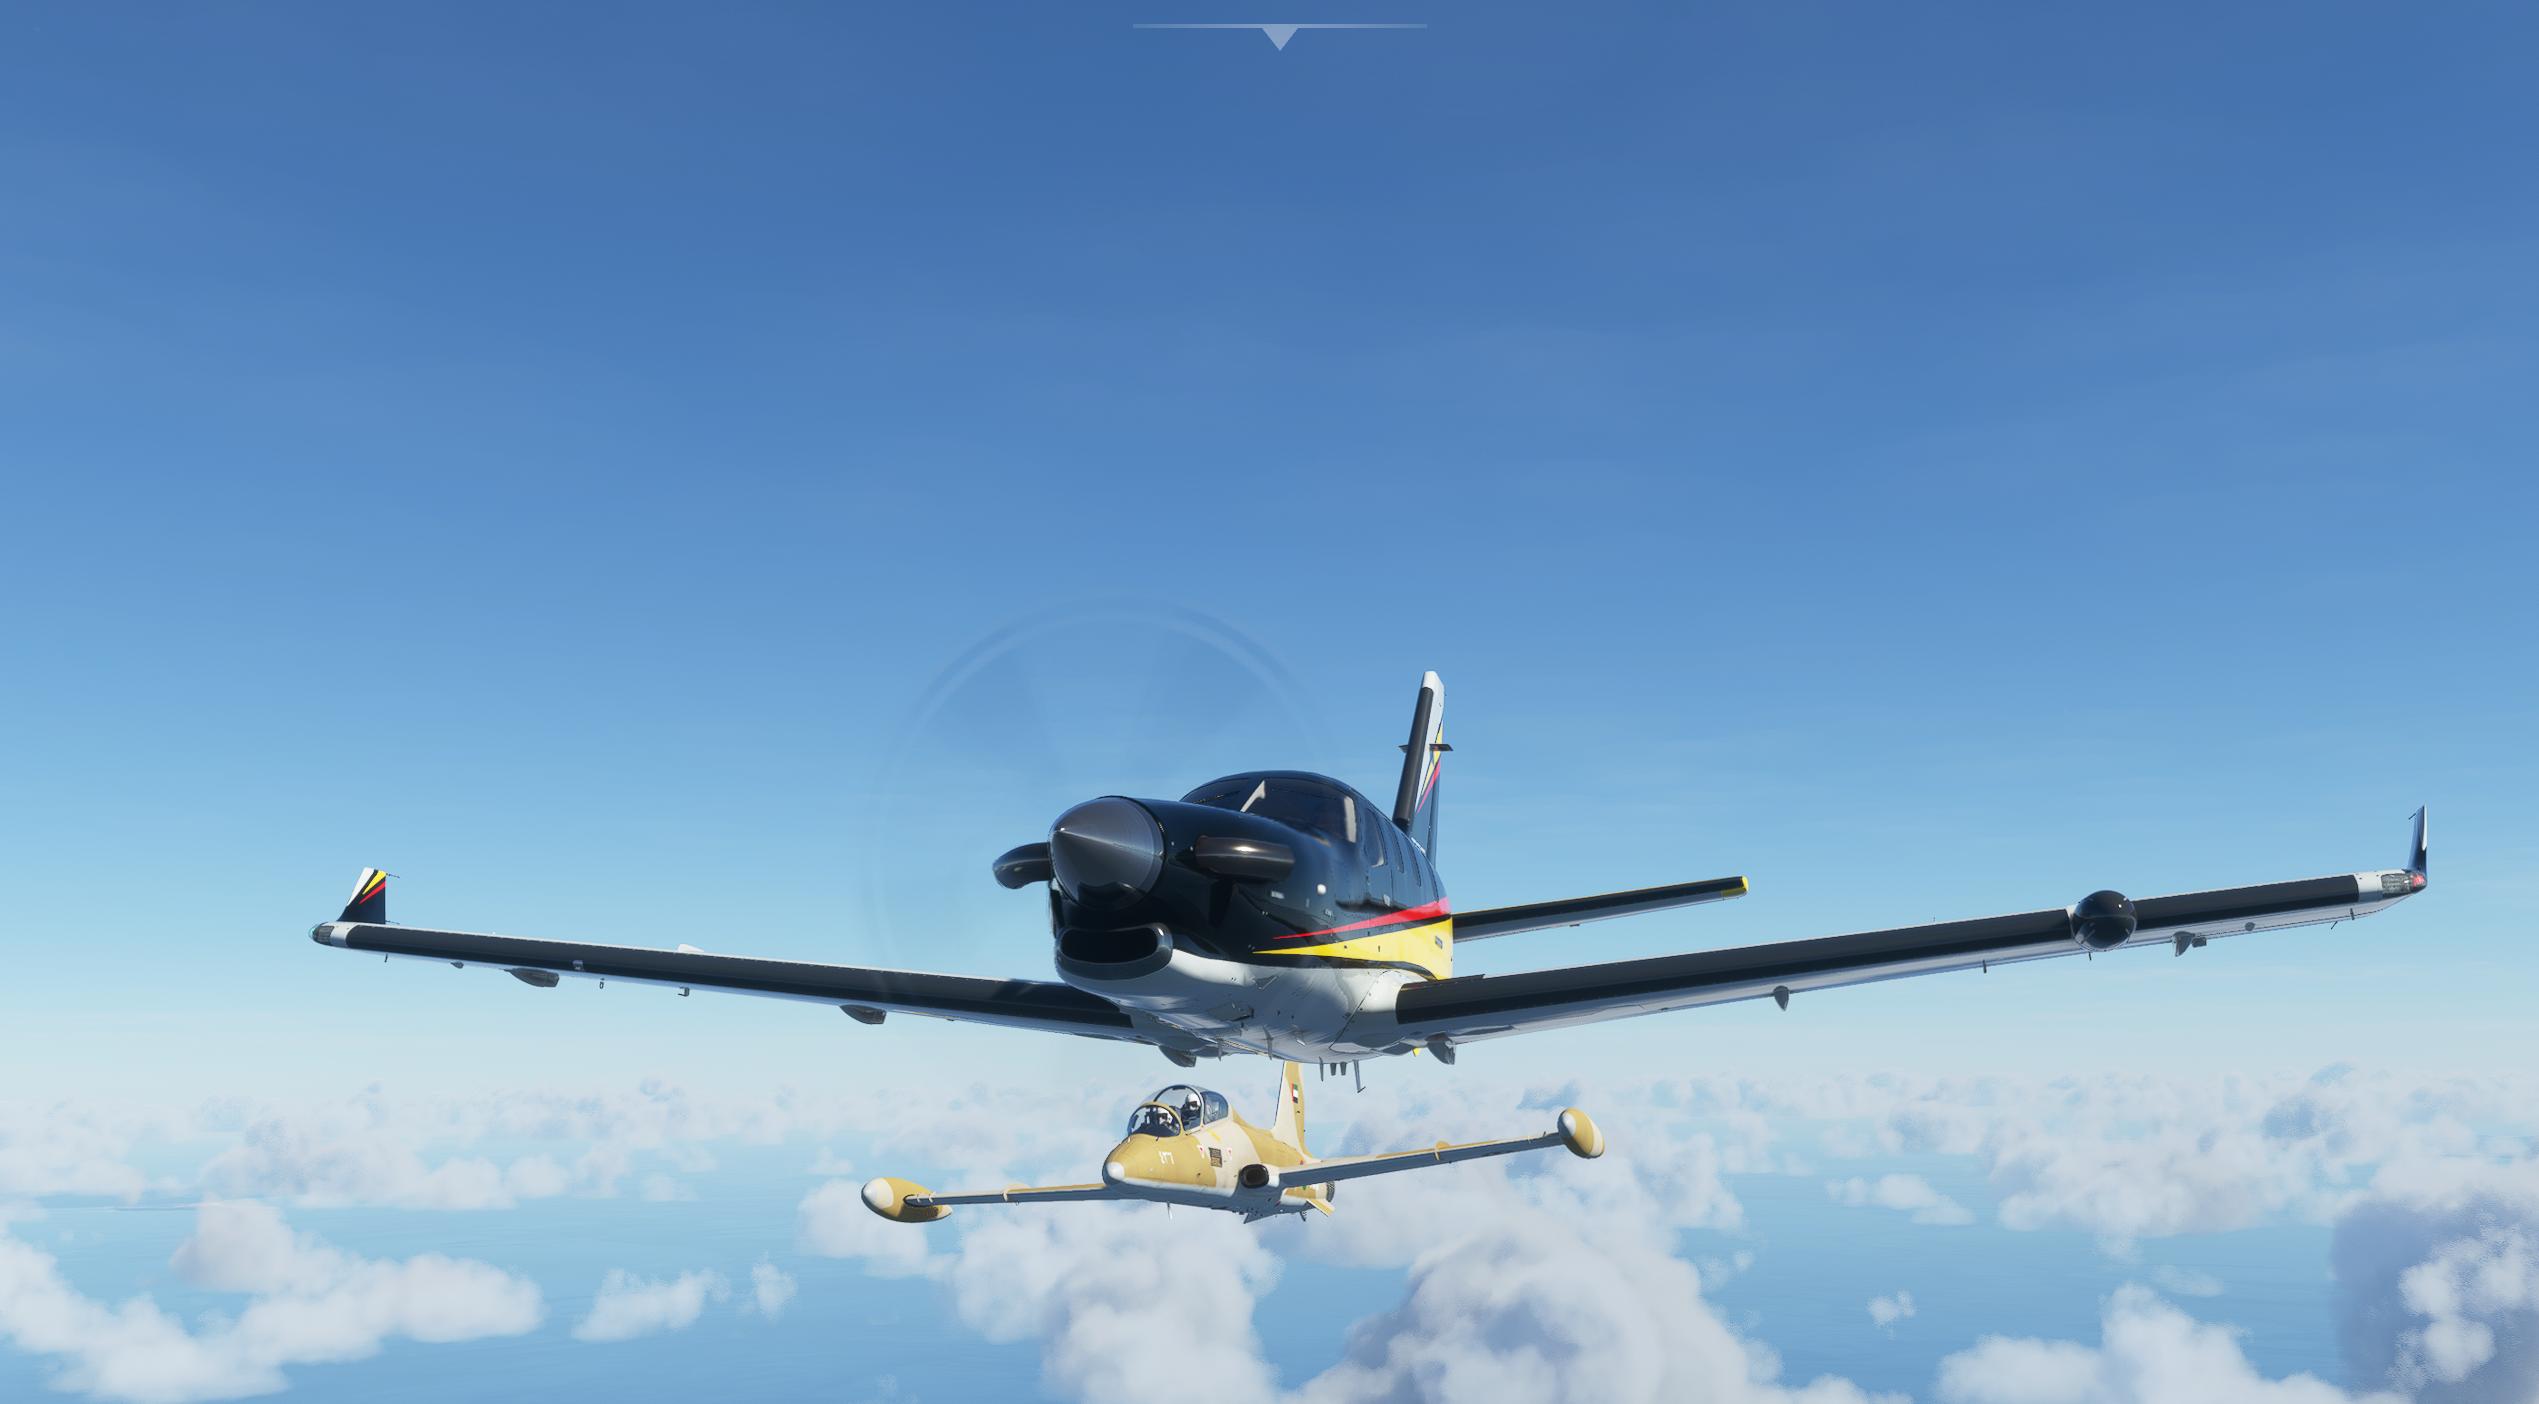 Flight Recorder (Repeticiones Gratis) Flight Simulator 2020